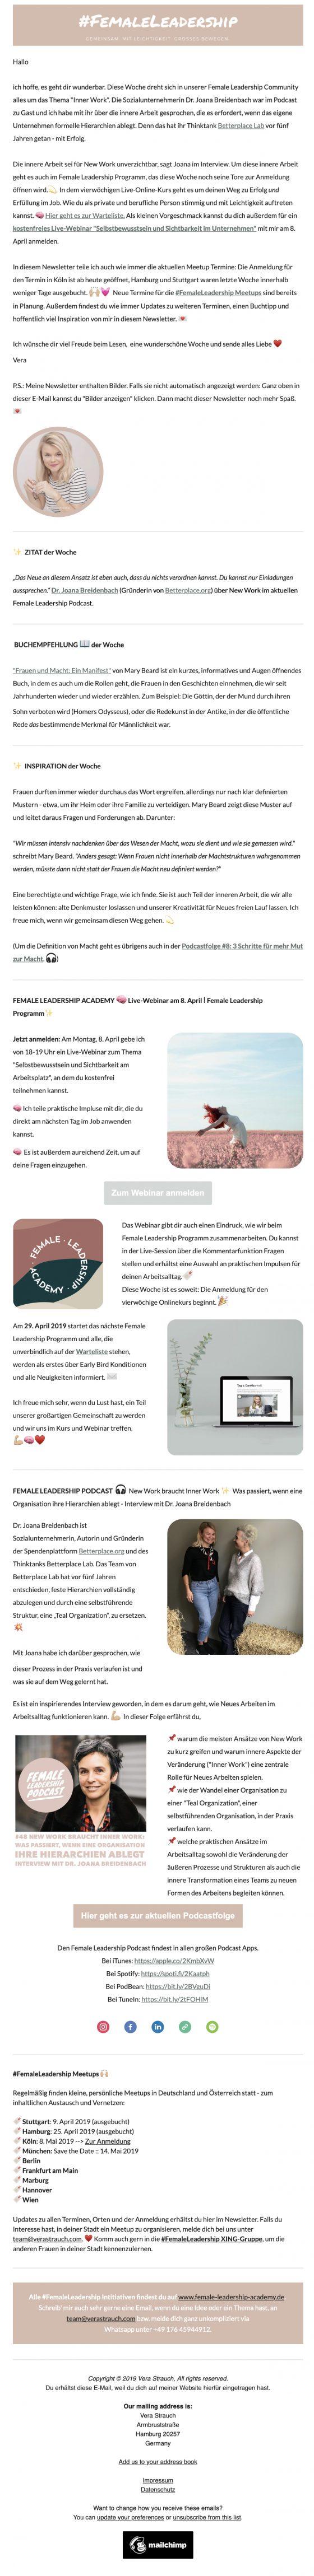 Female Leadership Newsletter Vorschau lang